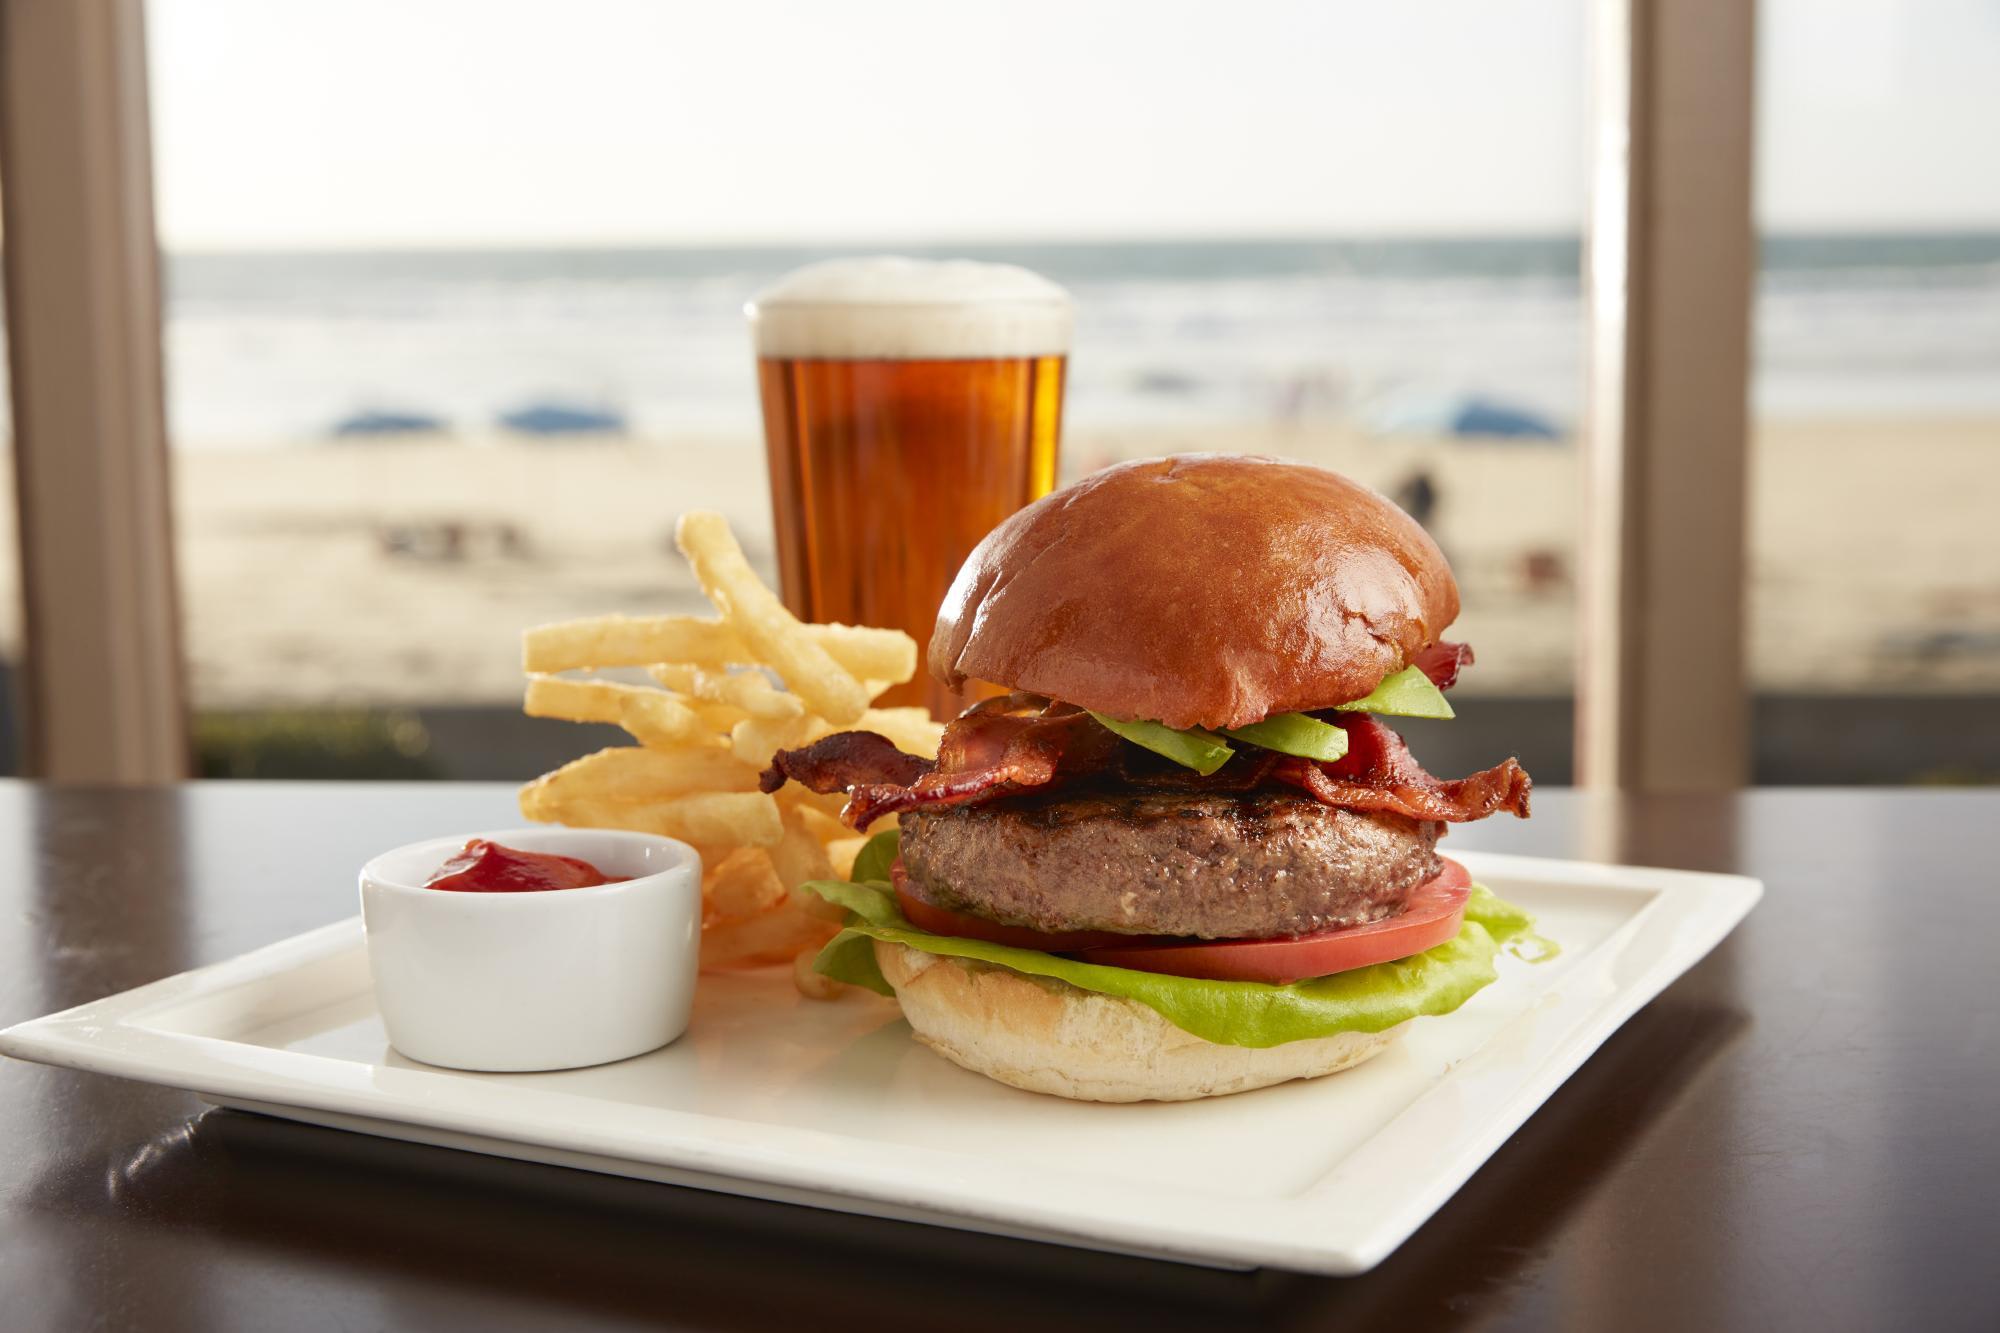 Shores Burger : 14.95 smoked cheddar, charred onion, grain mustard at Shores Restaurant, The